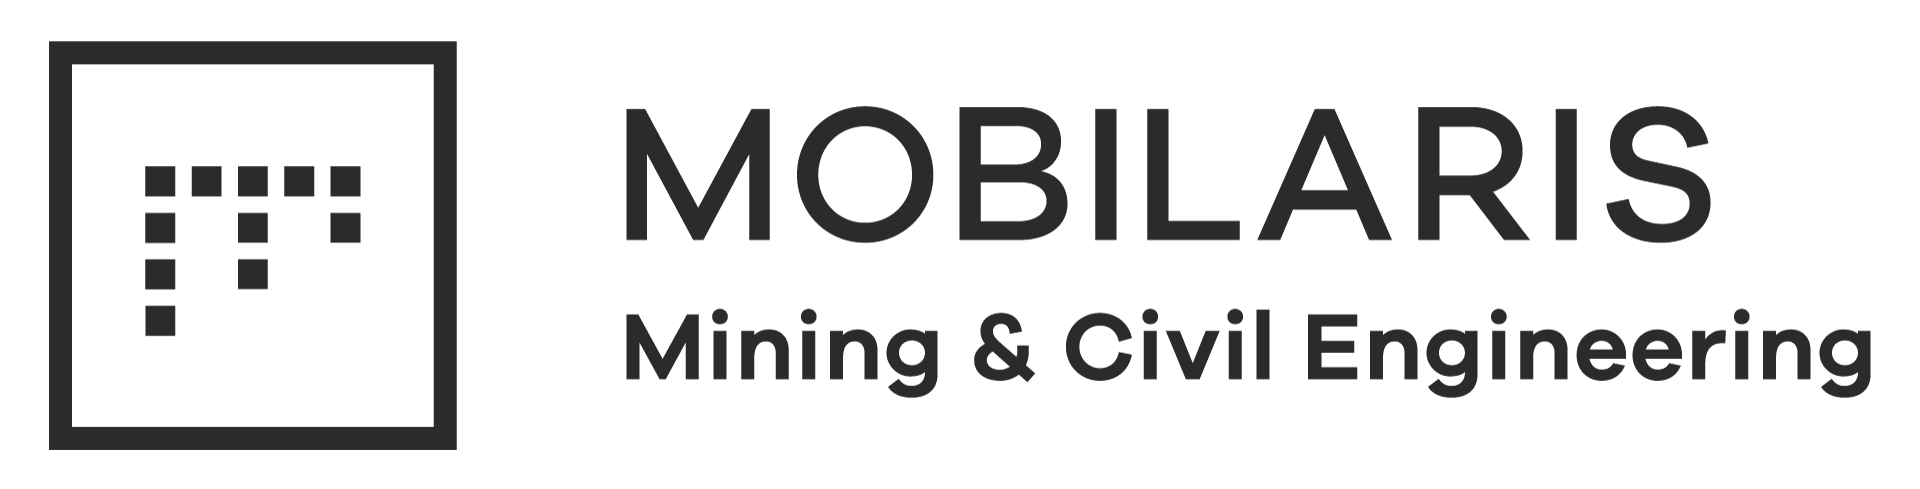 Mobilaris Mining & Civil Engineering empowers people in mining operations